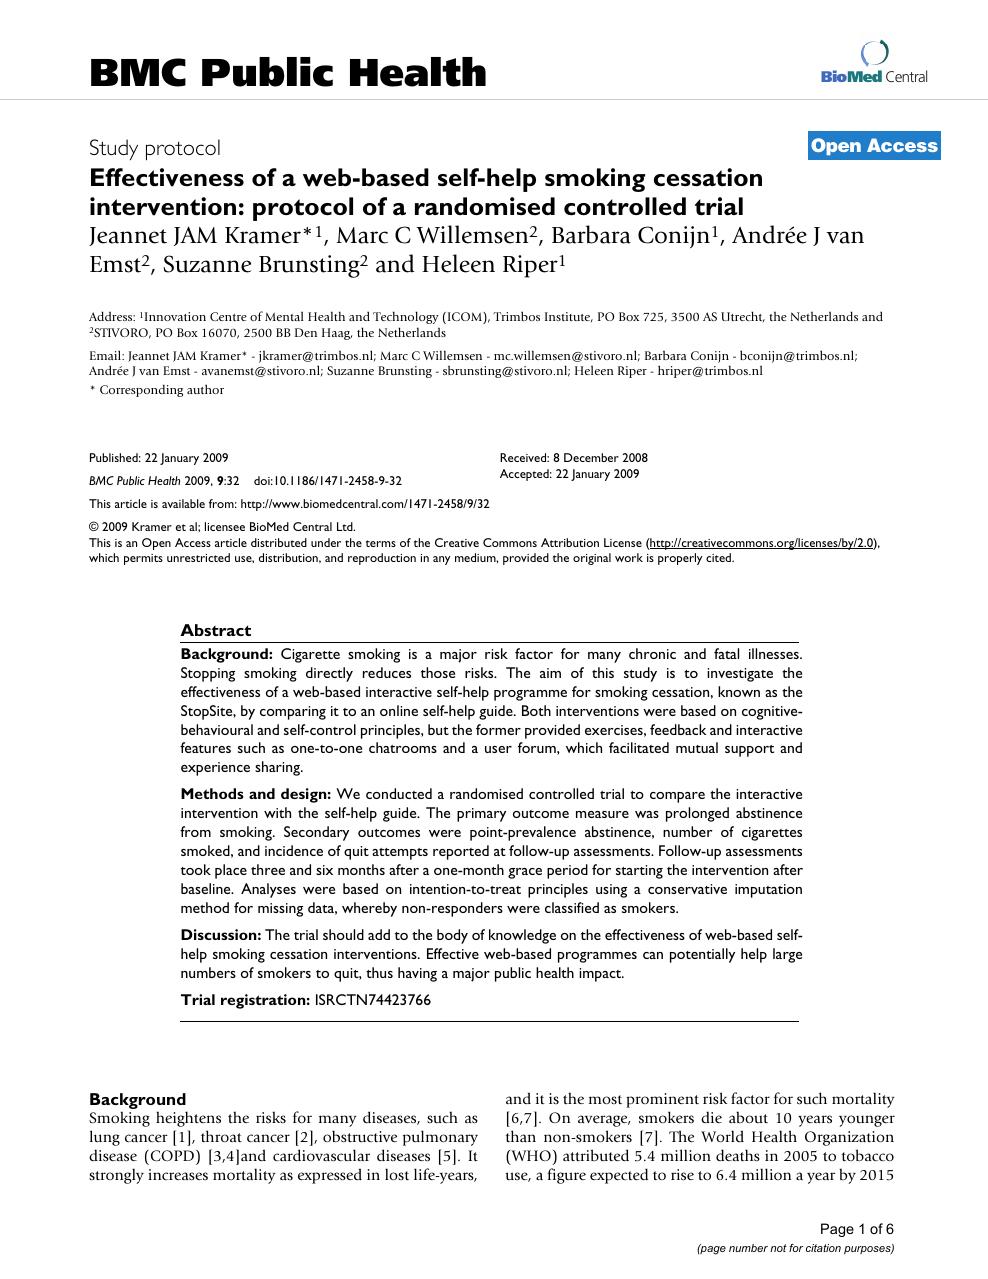 Effectiveness of a web-based self-help smoking cessation